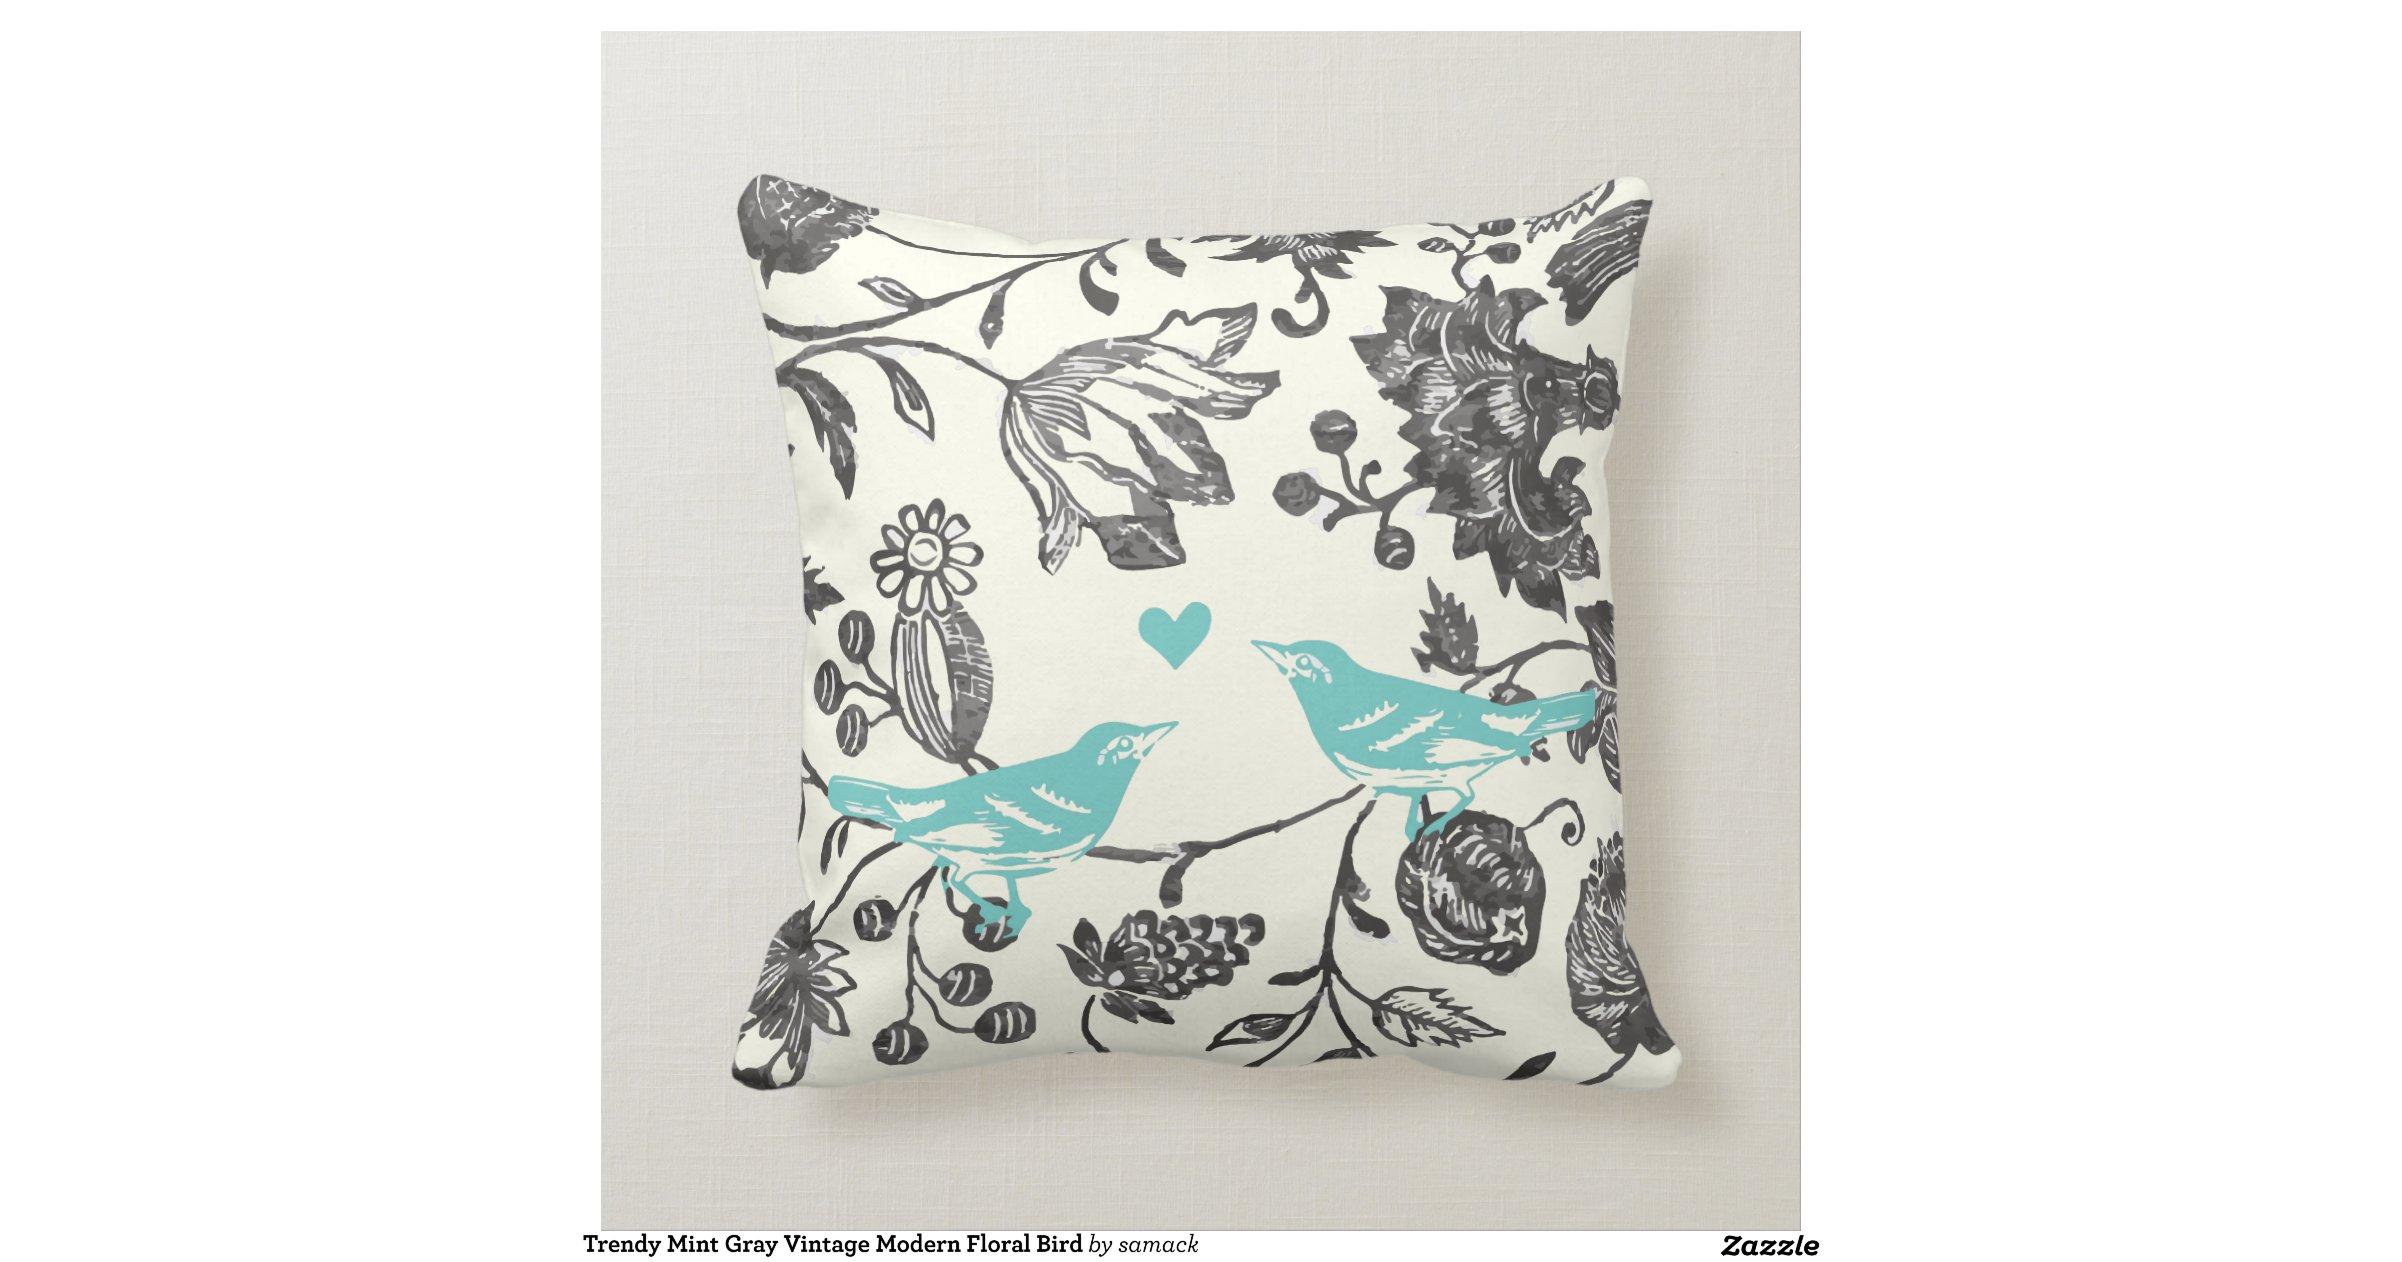 trendy_mint_gray_vintage_modern_floral_bird_pillow-r80737cbce90b4502b12b04d10c3d37fd_i52ni_8byvr ...